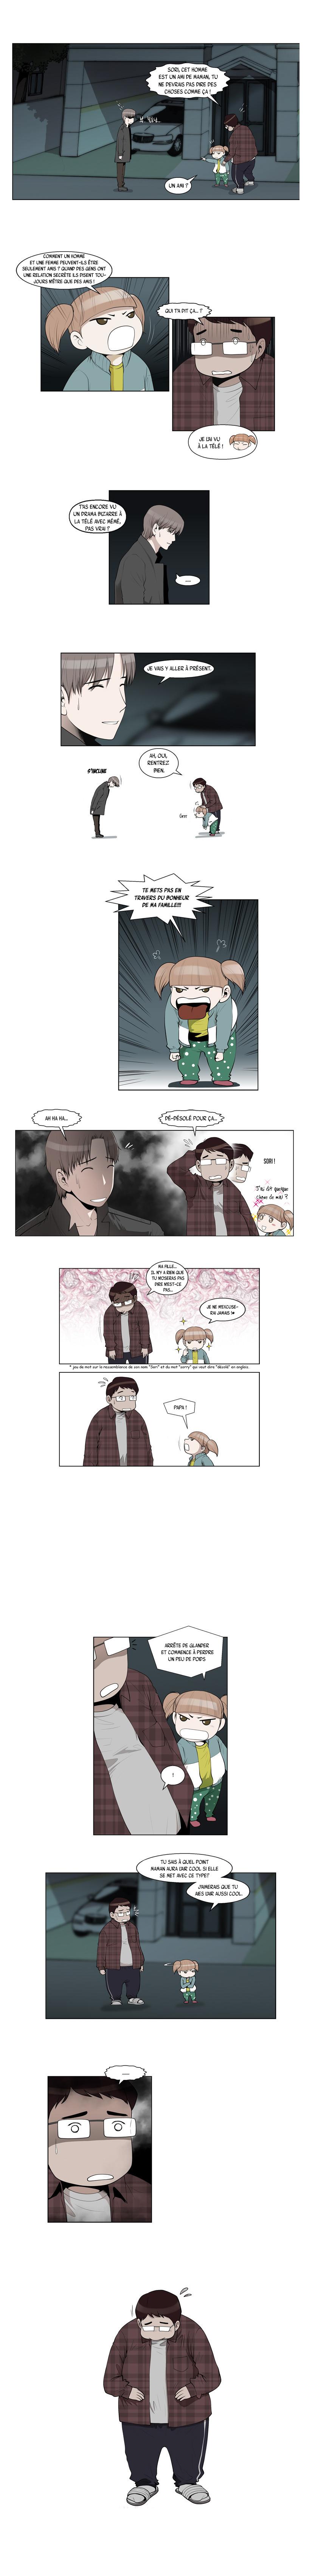 https://nine.mangadogs.com/fr_manga/pic1/63/639/33396/MrsAngel21VF_1_671.jpg Page 2